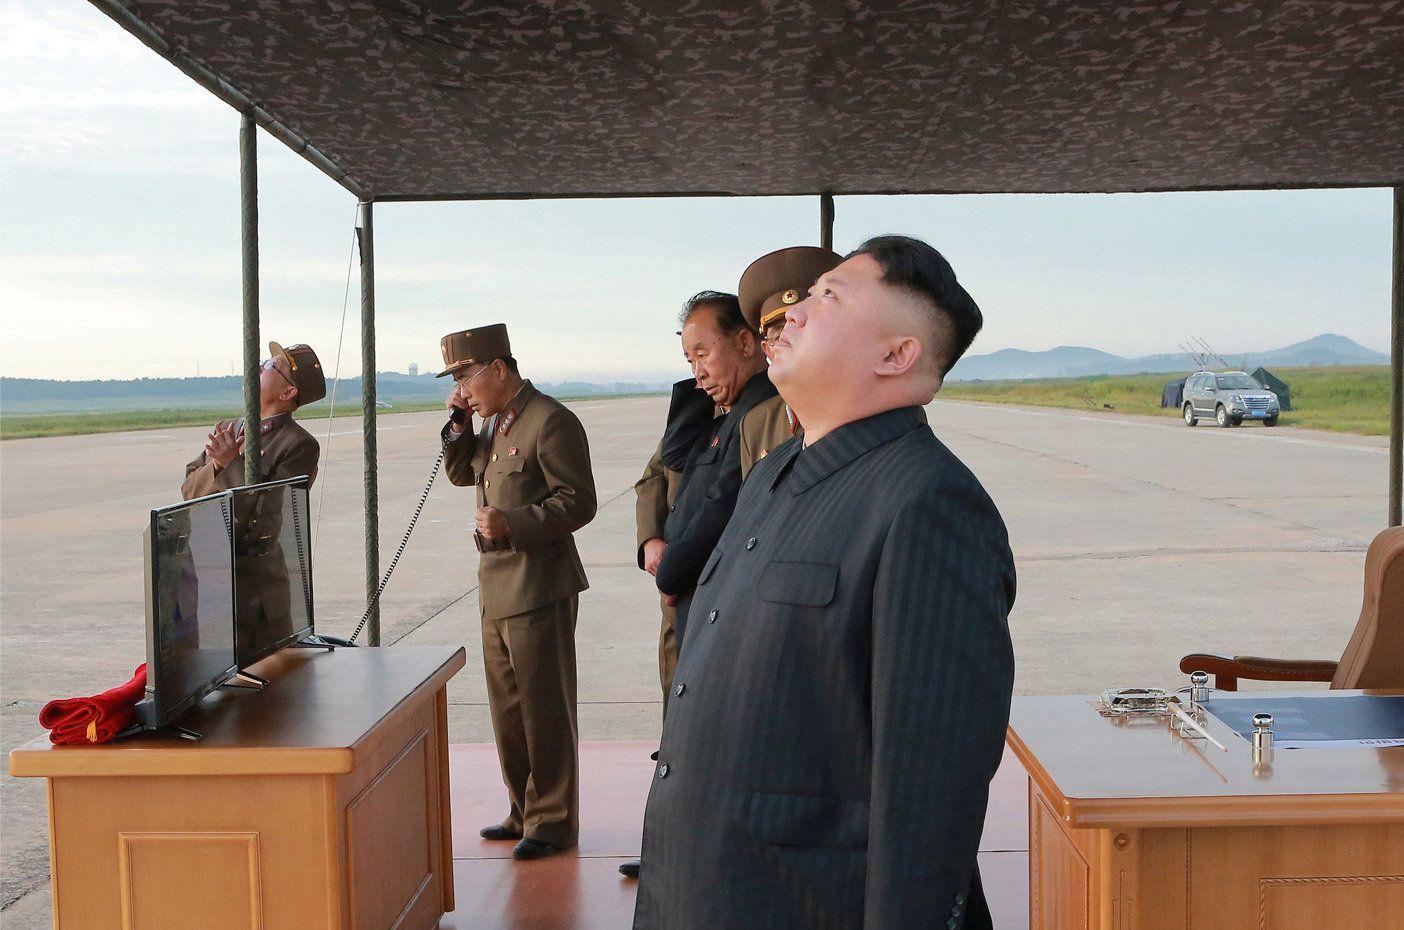 КНДР, Ким Чен, Ын, ракета, запуск